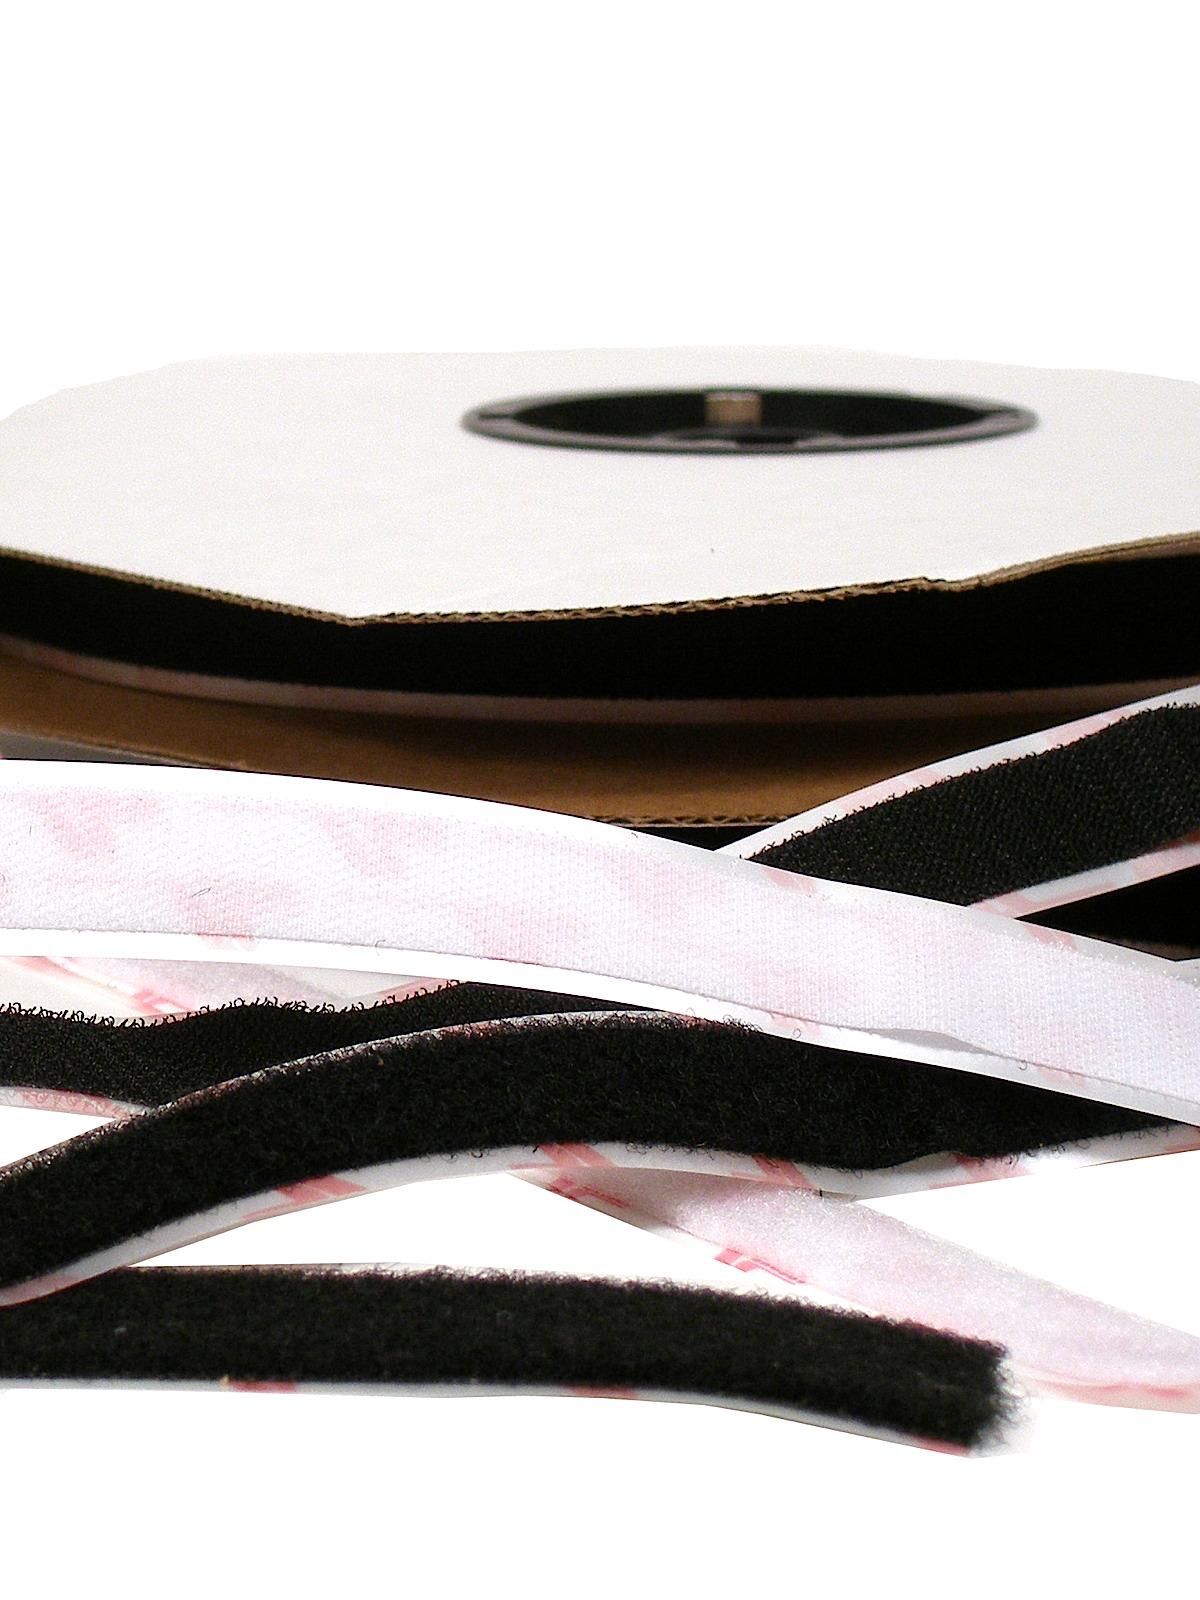 velcro closure tape. Black Bedroom Furniture Sets. Home Design Ideas